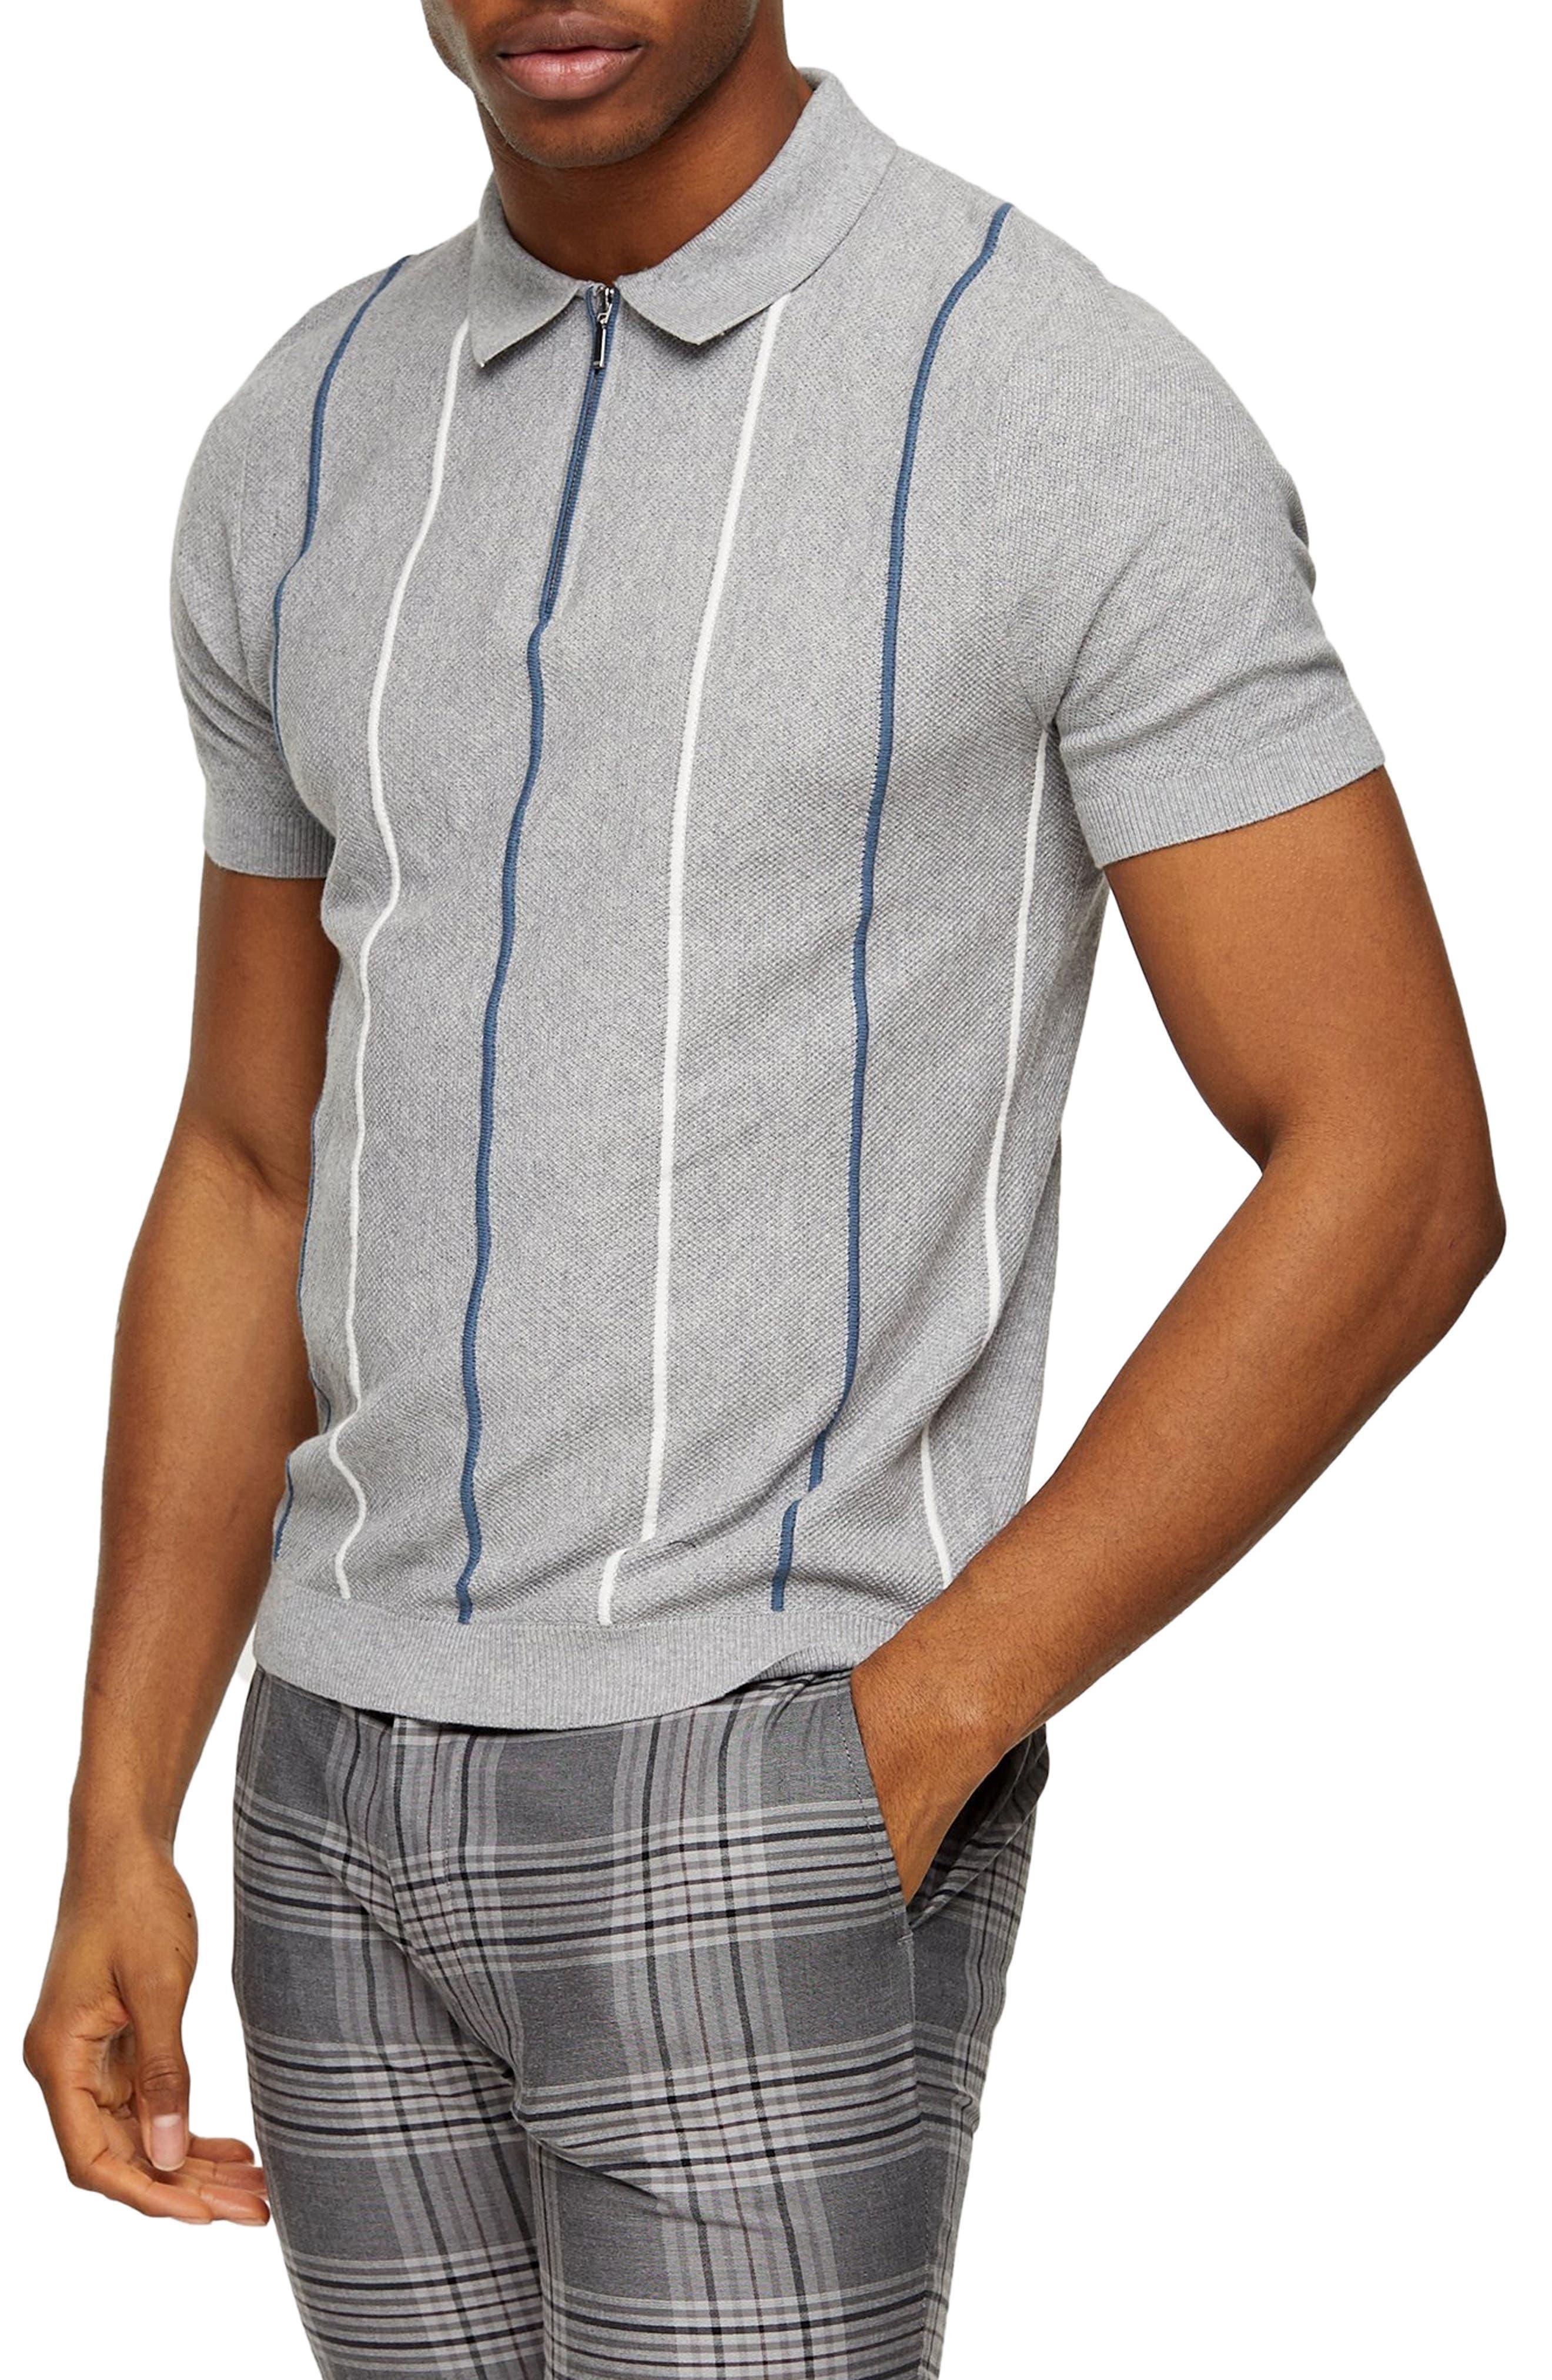 1960s Mens Shirts | 60s Mod Shirts, Hippie Shirts Mens Topman Stripe Pique Zip Polo Size XX-Large - Grey $30.00 AT vintagedancer.com